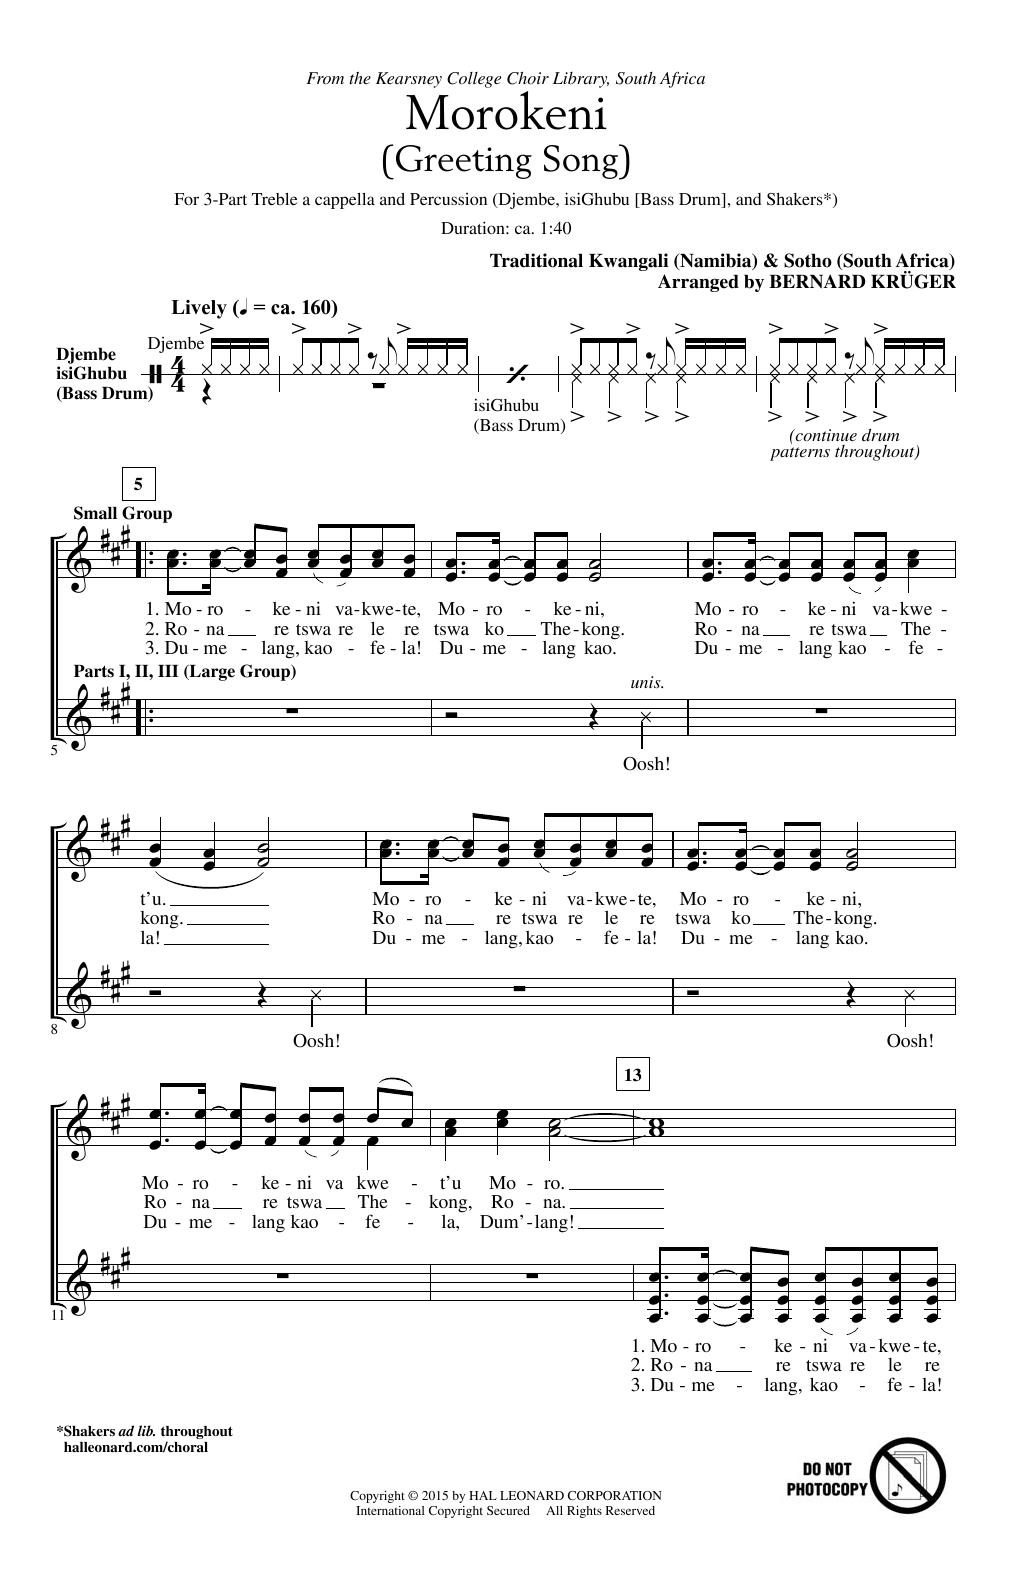 Download Bernard Krüger 'Morokeni (Welcome Song)' Digital Sheet Music Notes & Chords and start playing in minutes